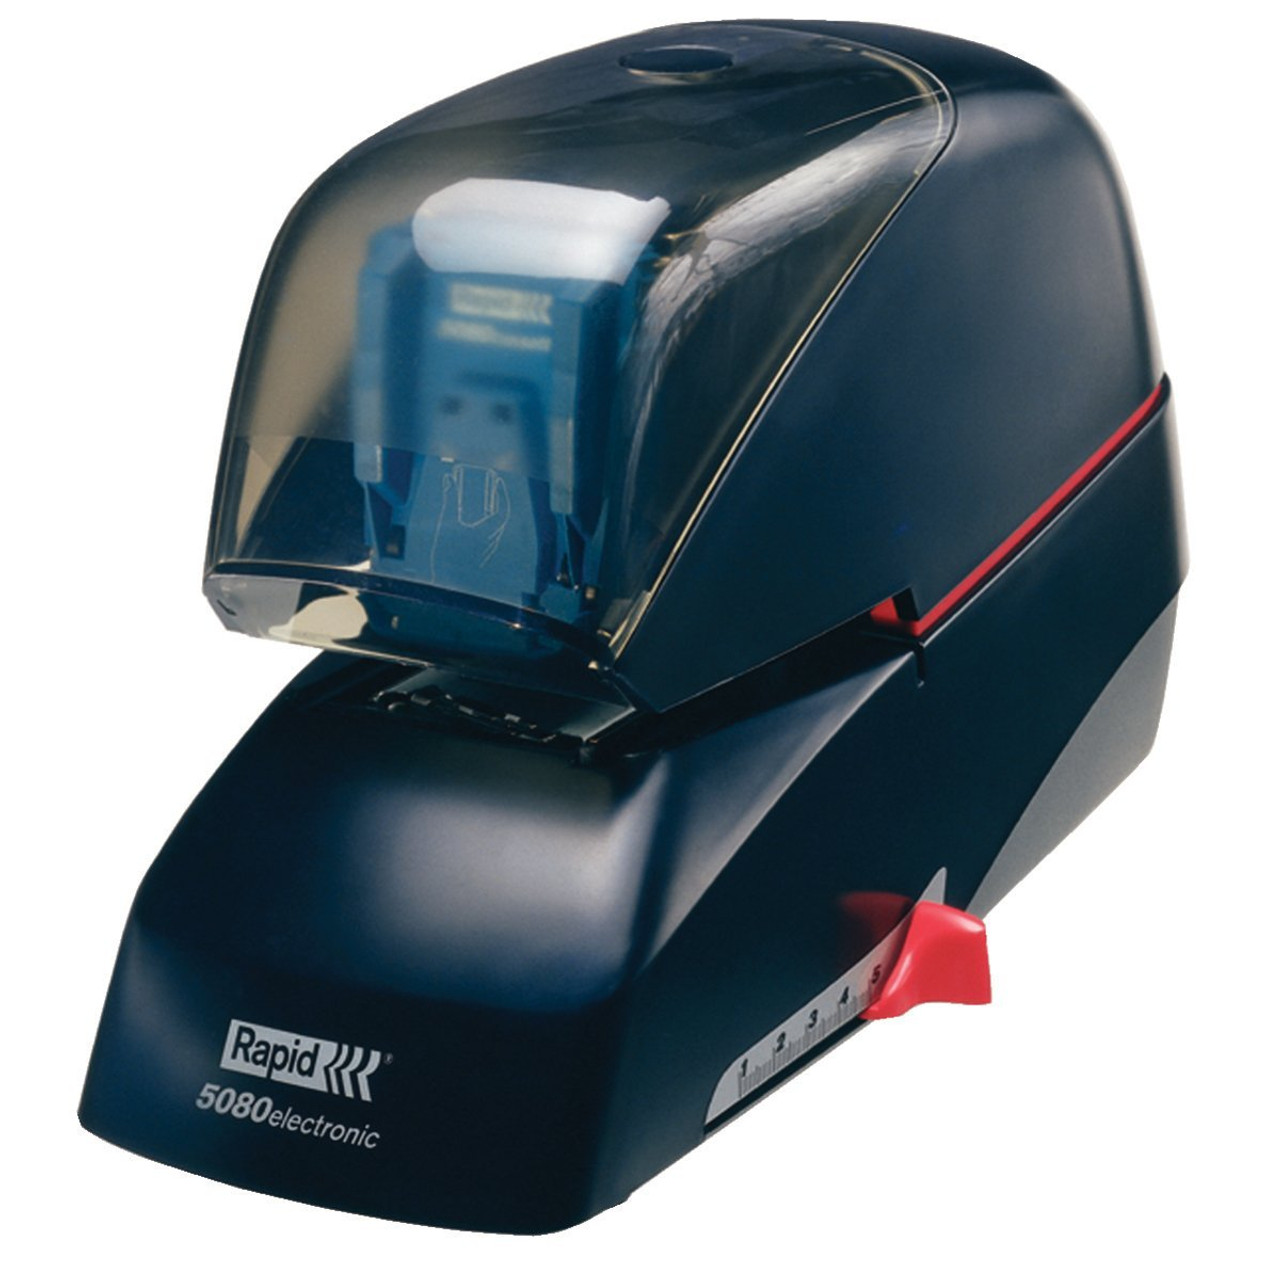 Rapid® 5080 Professional  Automatic Electric Heavy-Duty Desktop Stapler